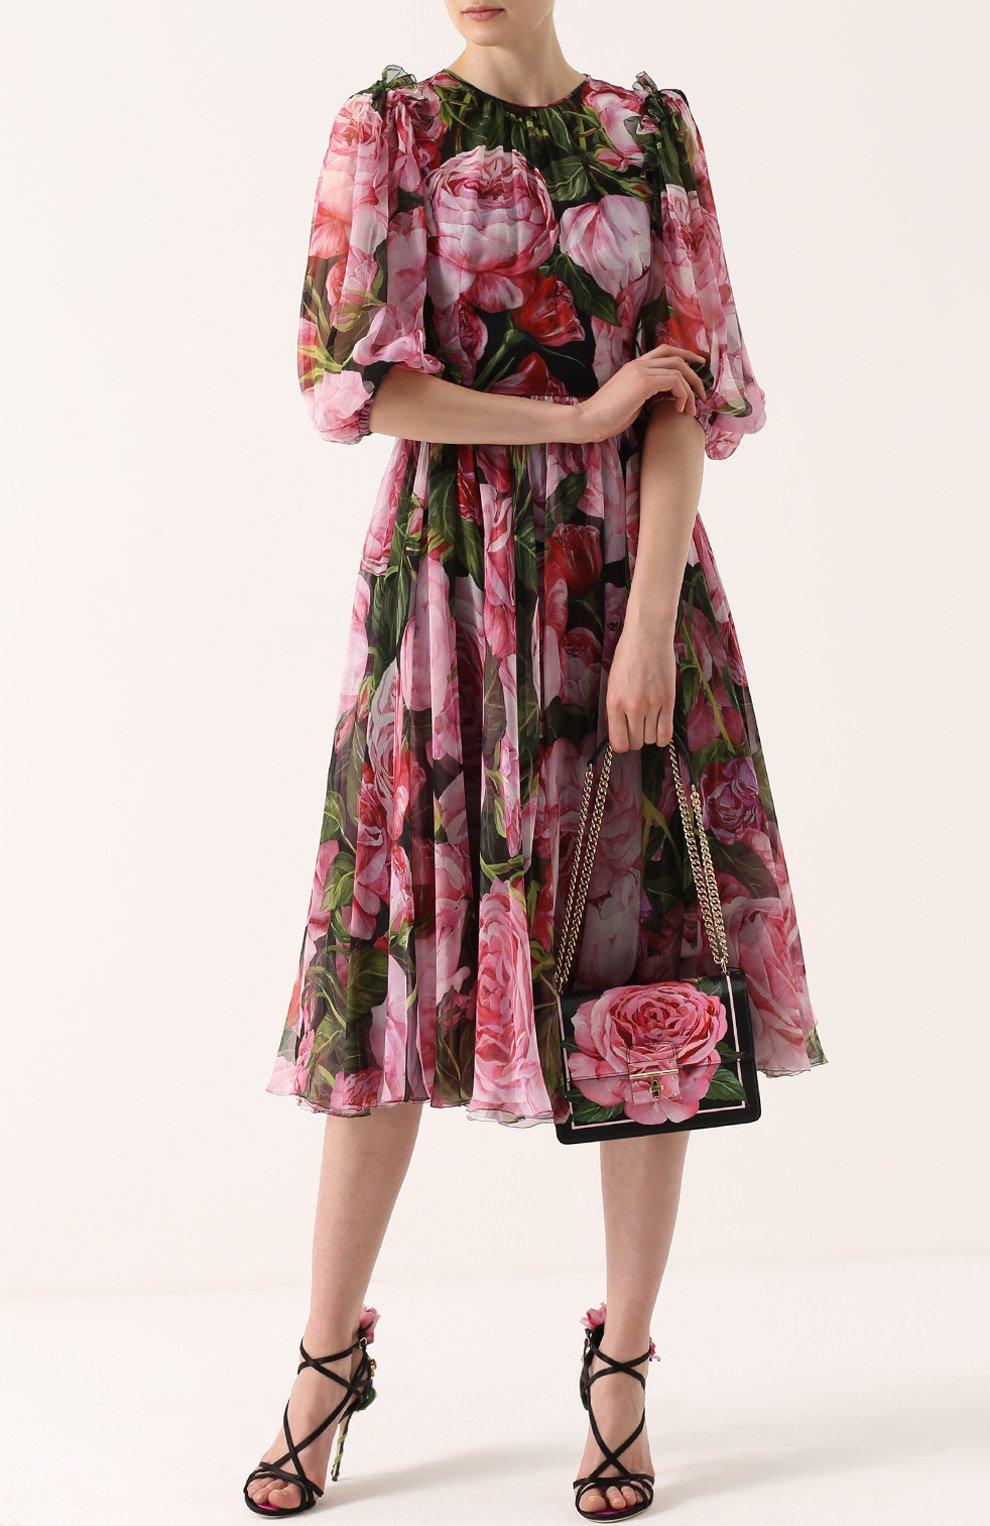 Сумка Rosalia small с принтом Dolce & Gabbana розовая цвета | Фото №2